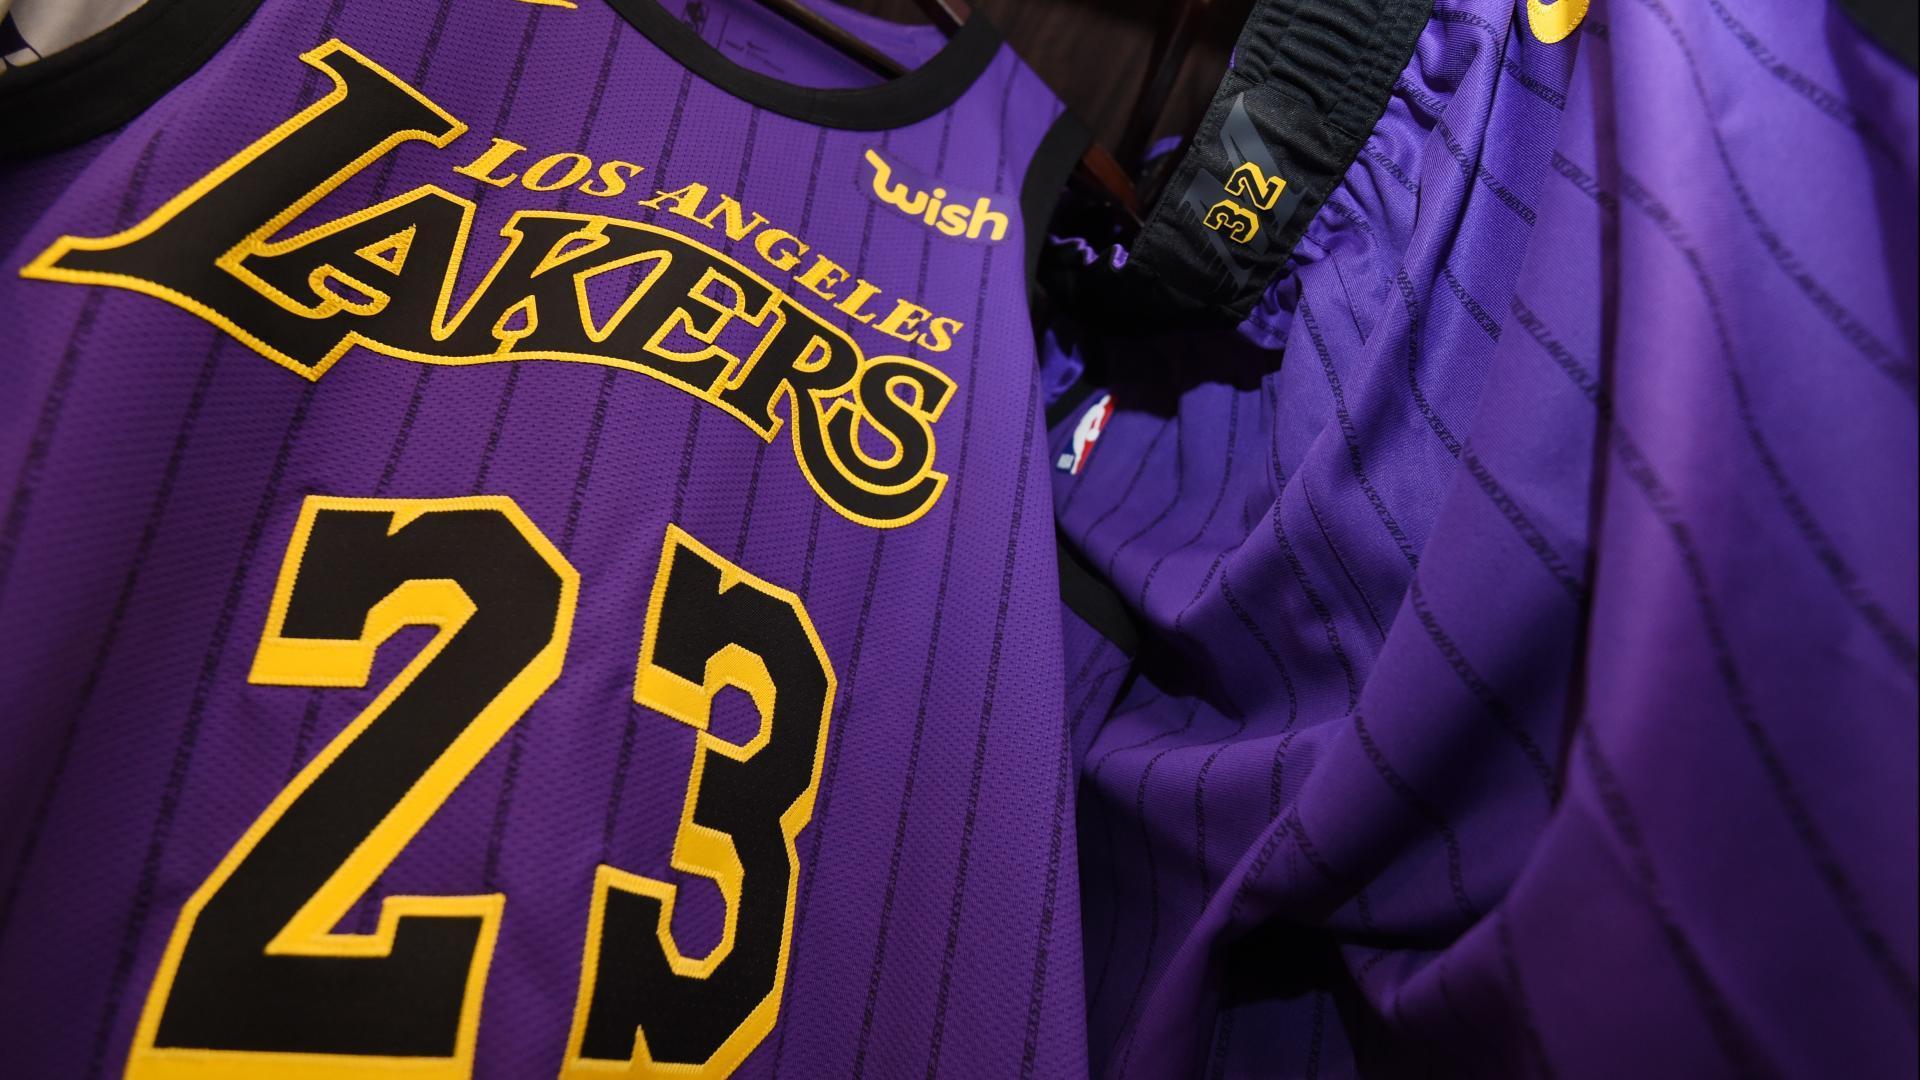 LeBron, Lakers top NBA's most popular merchandise lists   NBA.com